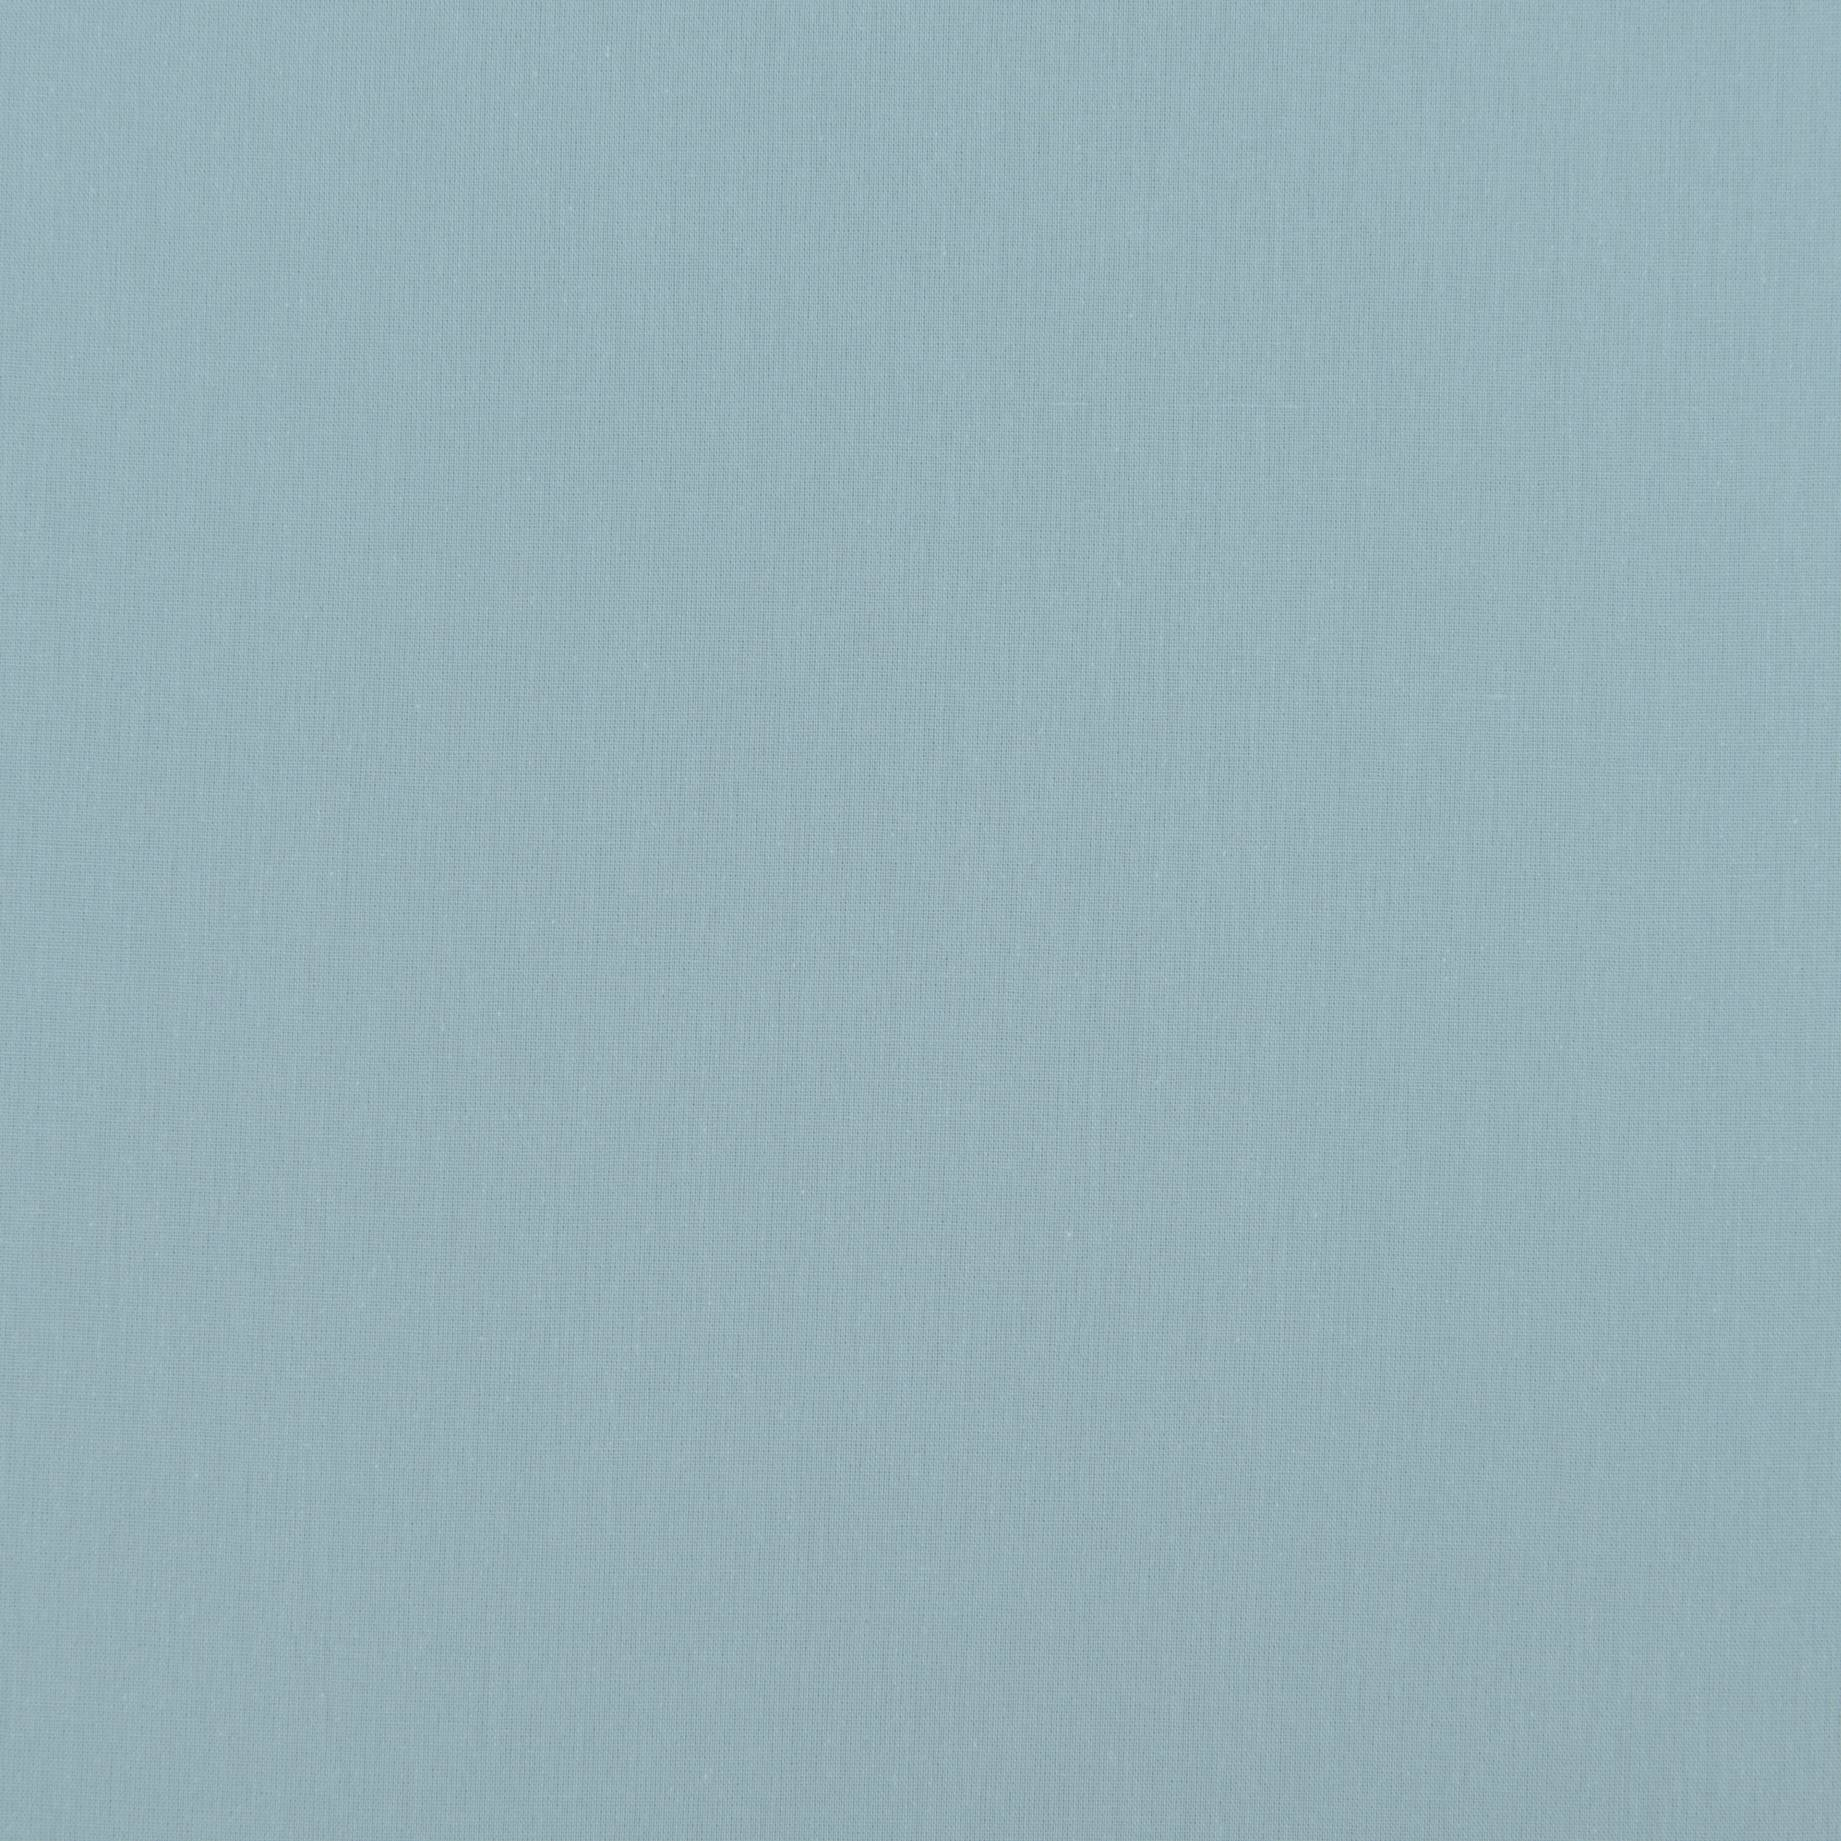 Бязь, мятный, 50х50 см, хлопок 100%, 125 г/м²